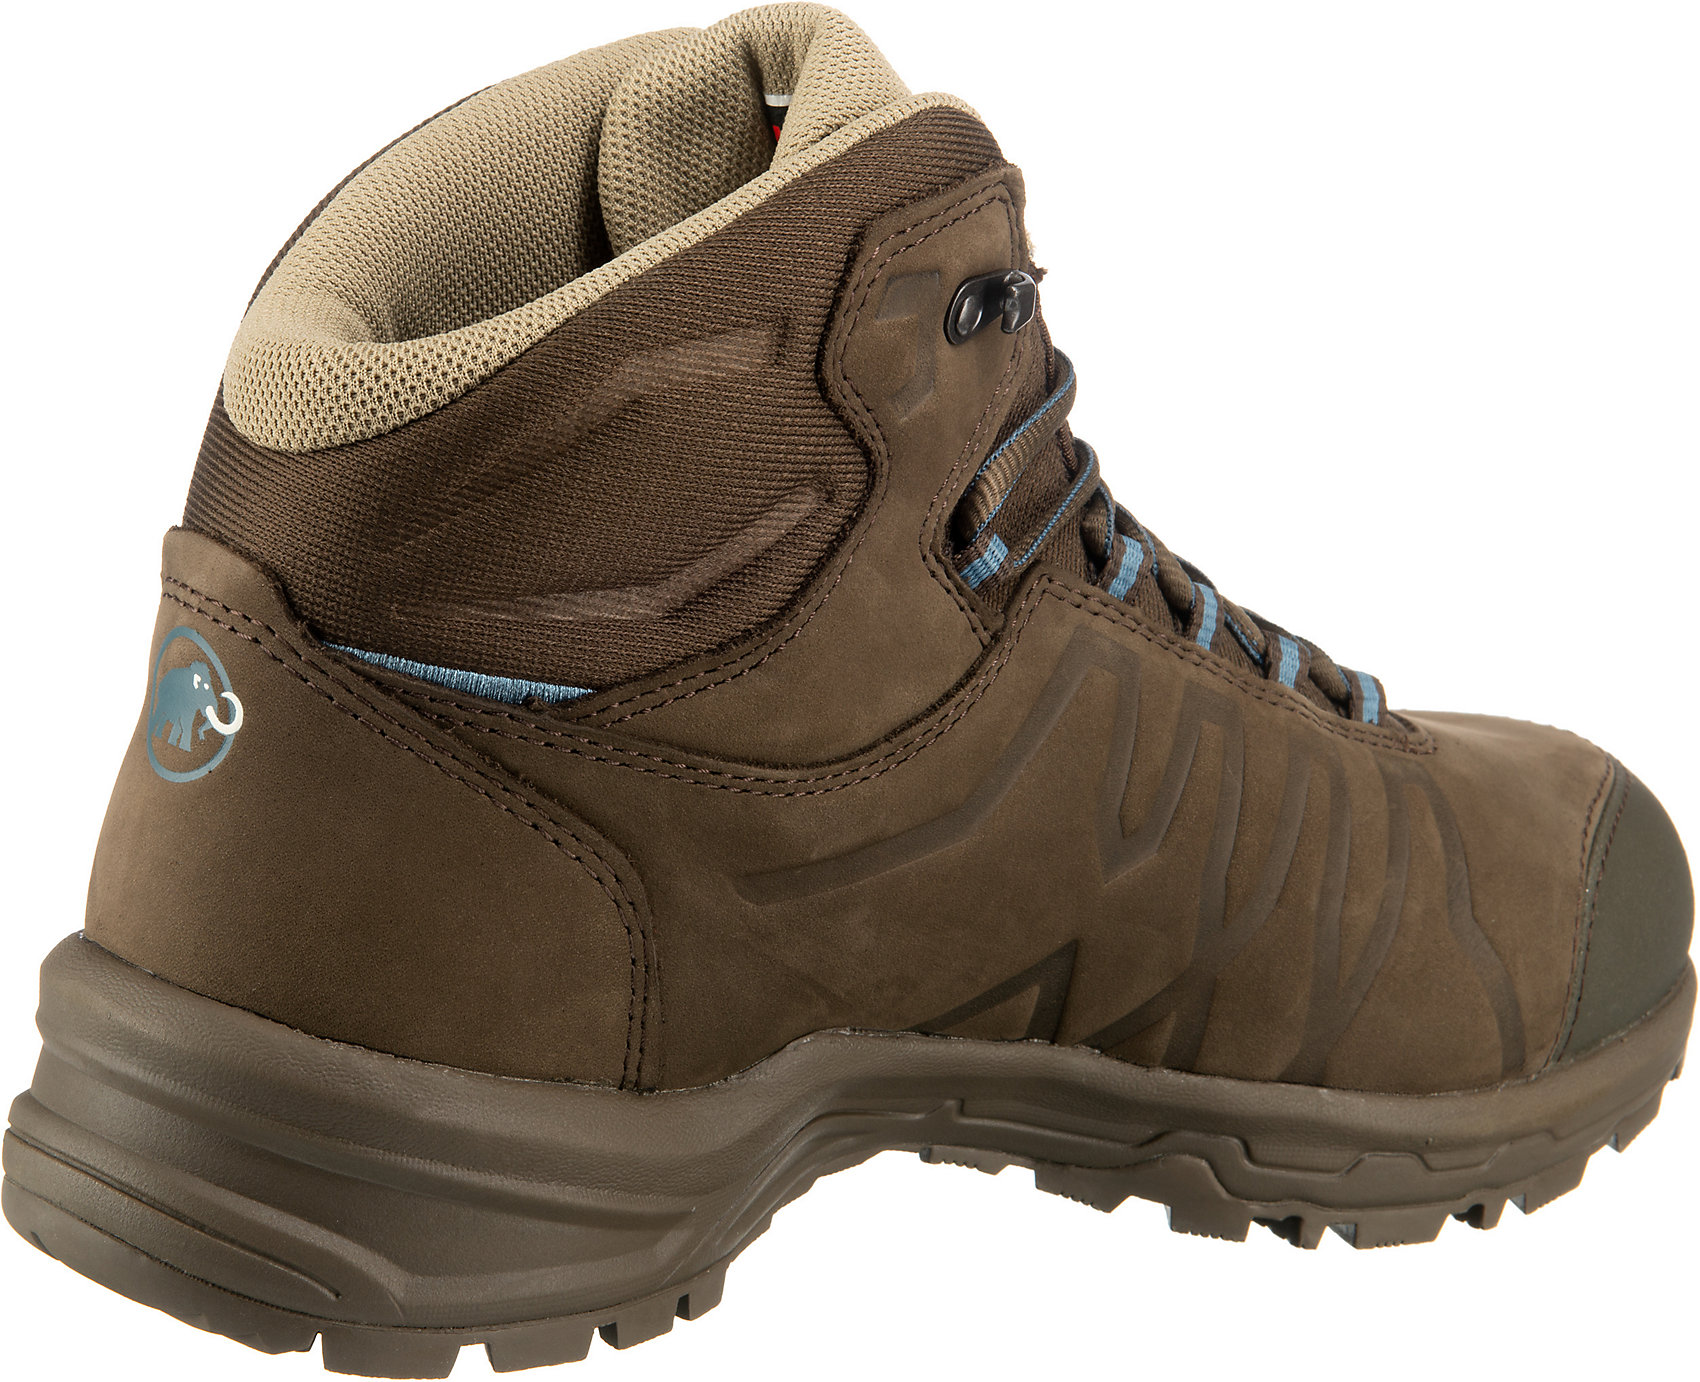 Neu Mammut Mercury Iii Mid Gtx® Men Trekkingstiefel 12287071 für Herren